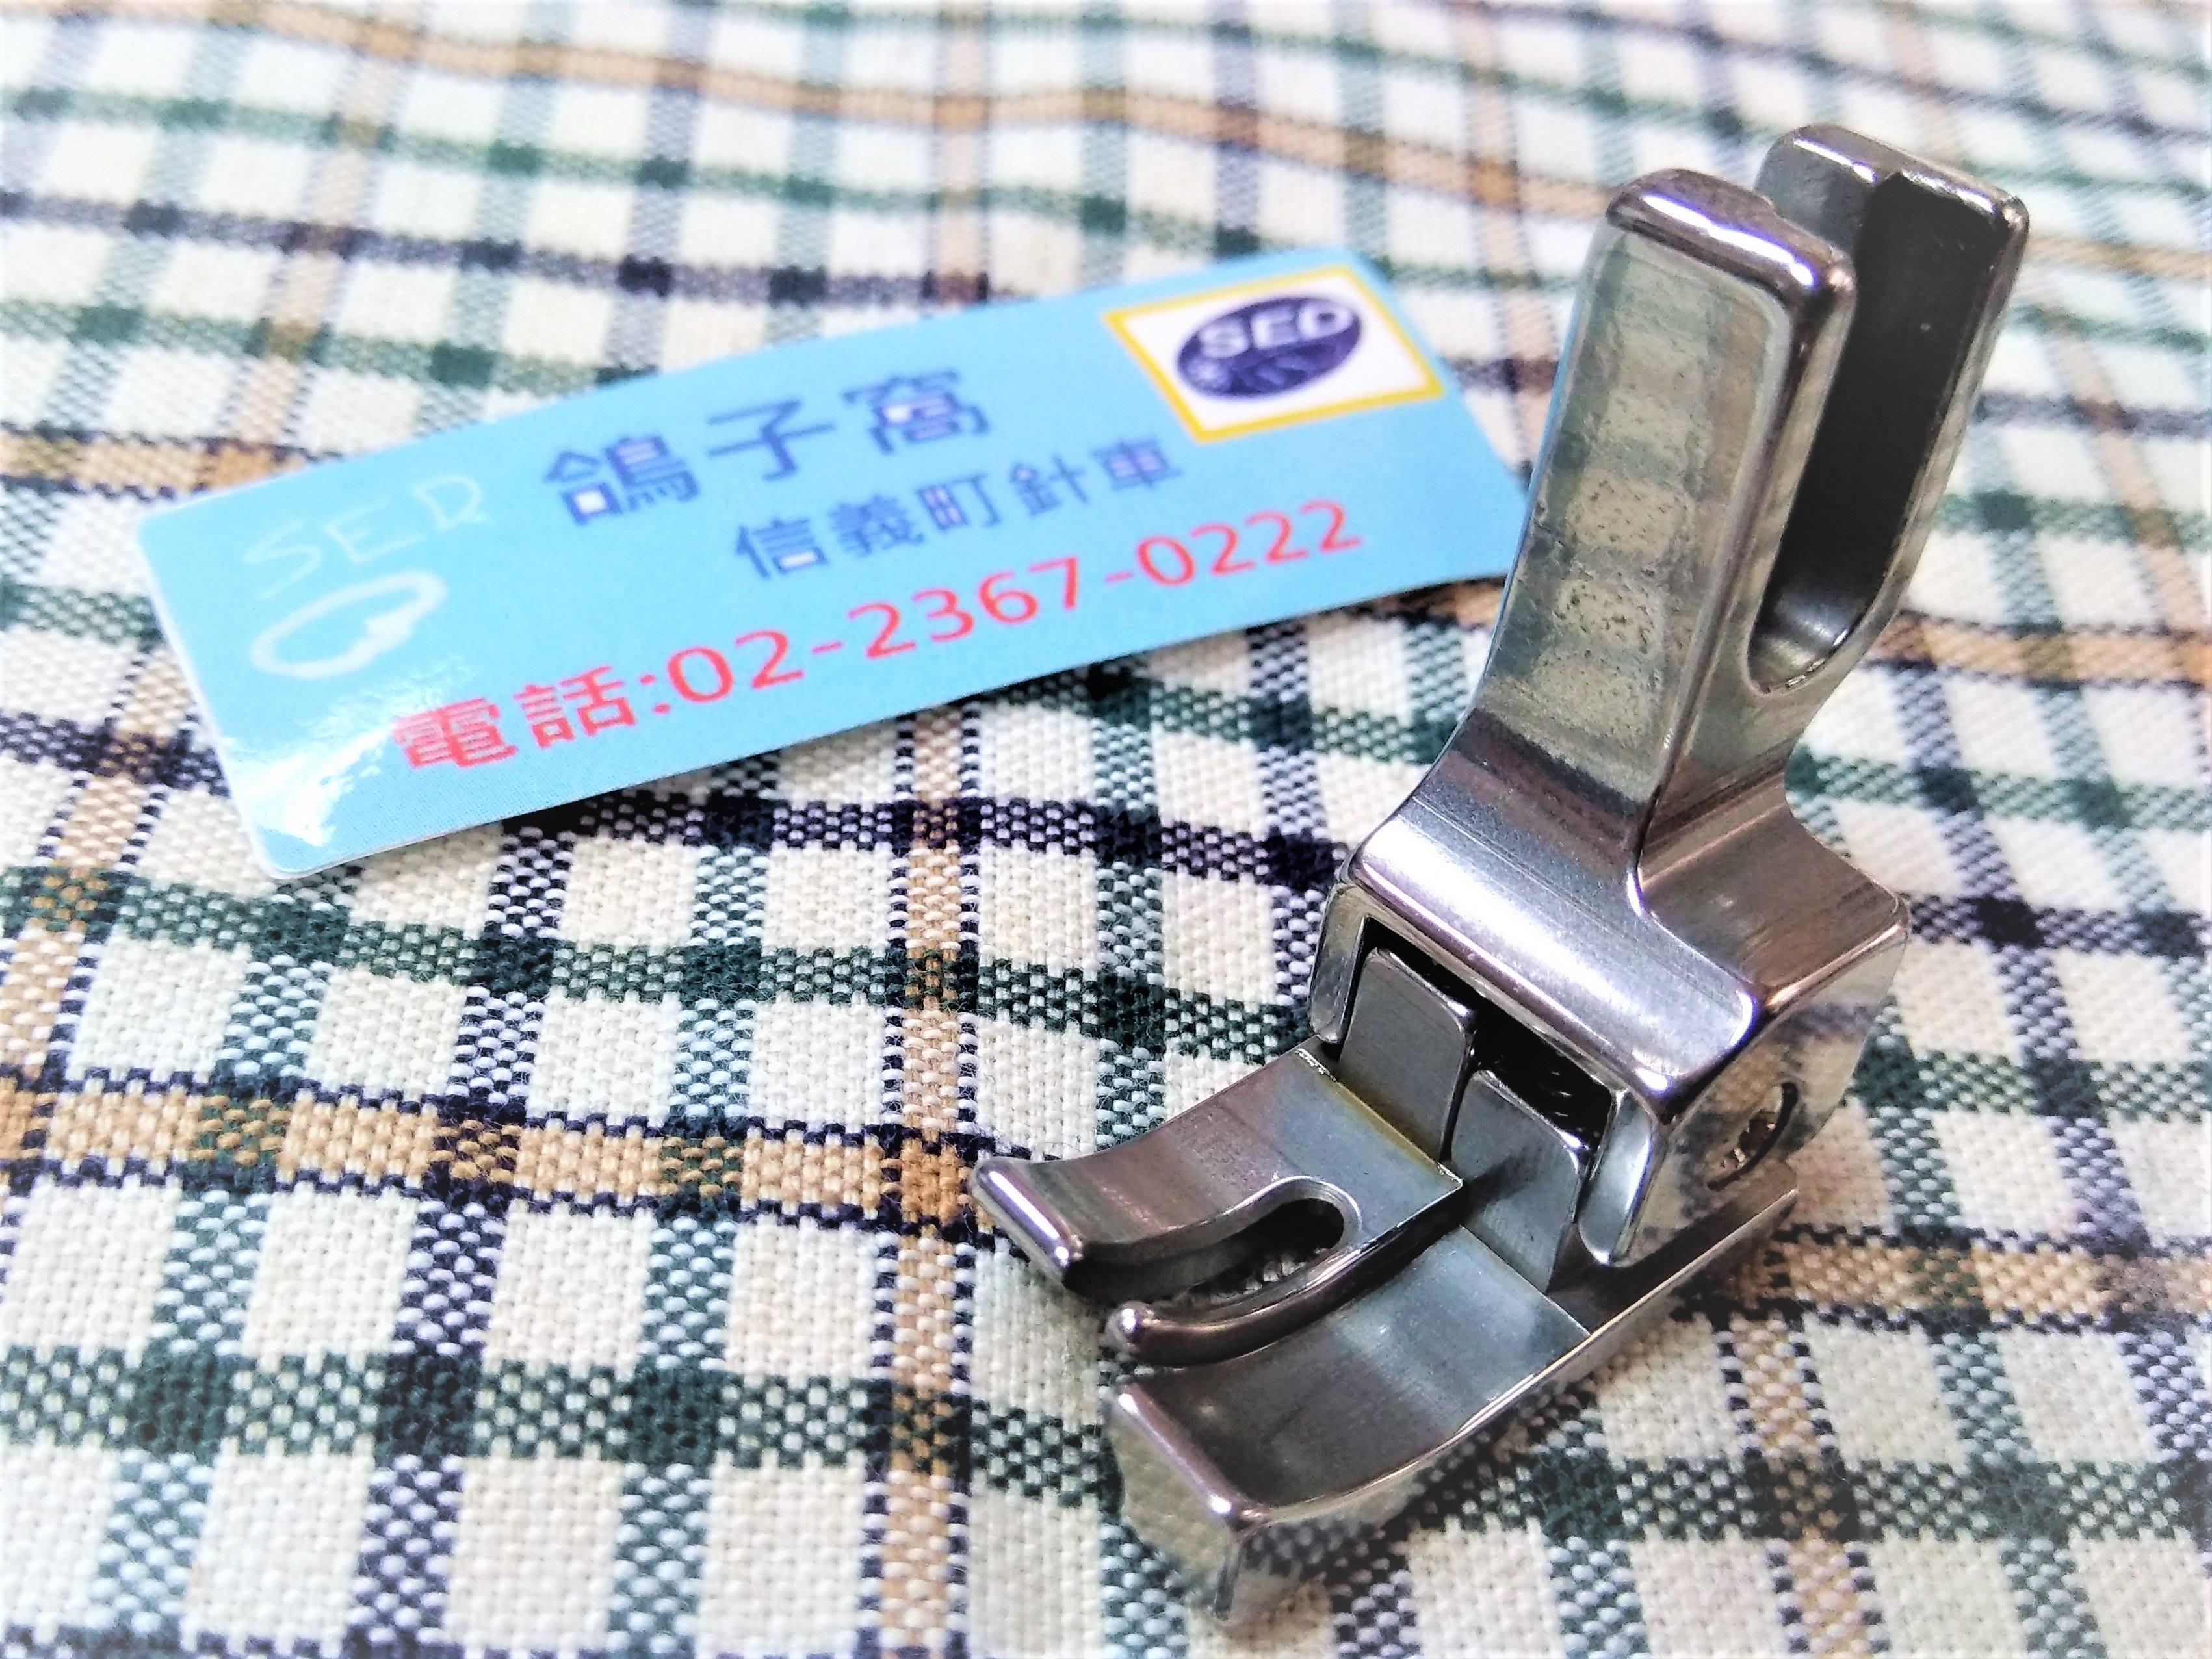 SED鴿子窩:工業平車&仿工業平車高低壓腳 工業用縫紉機/縫衣機 2.0 、 1.0